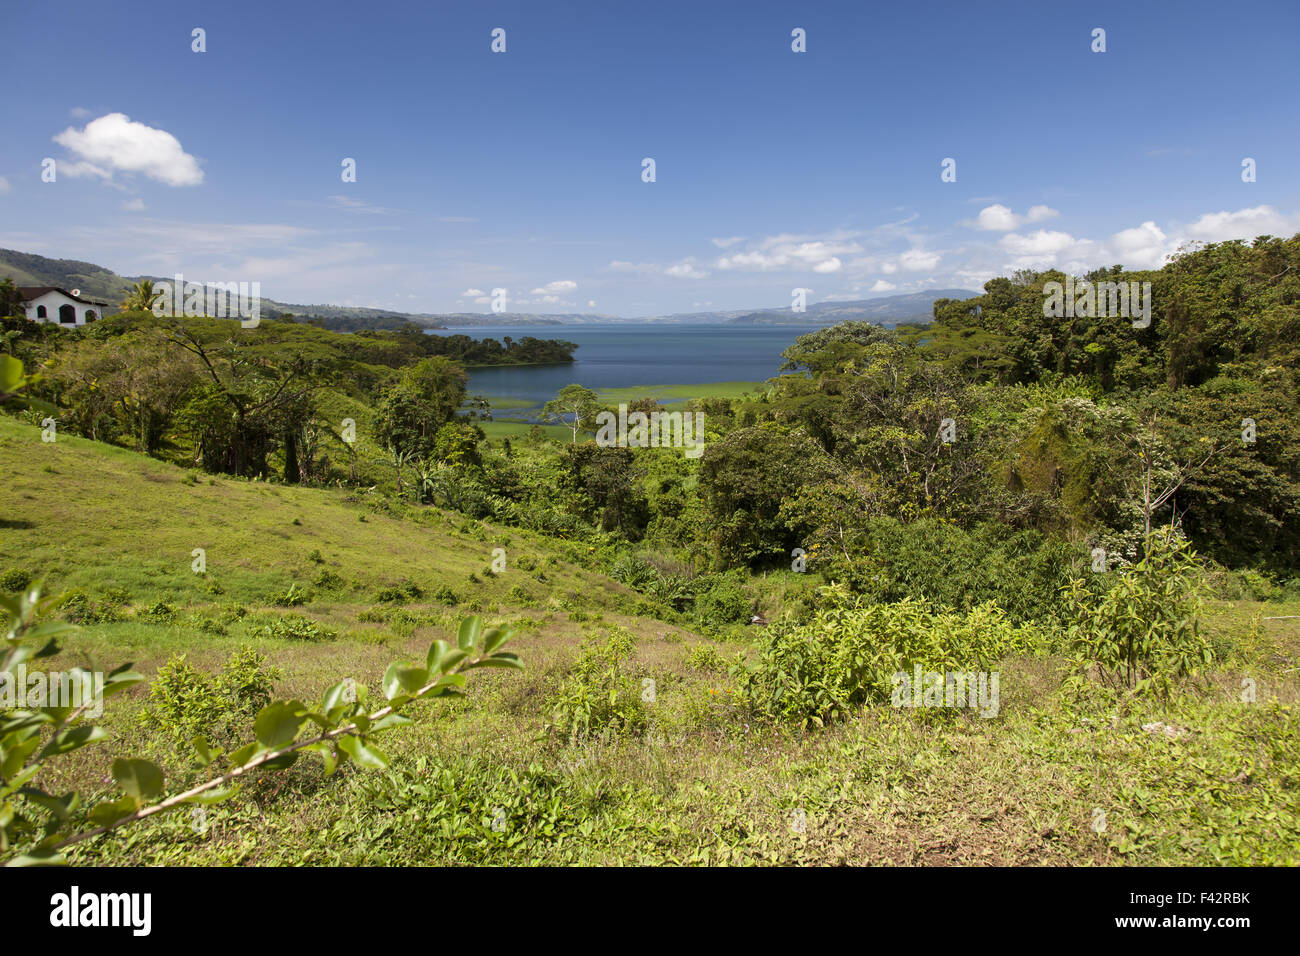 Lake Arenal in Costa Rica - Stock Image